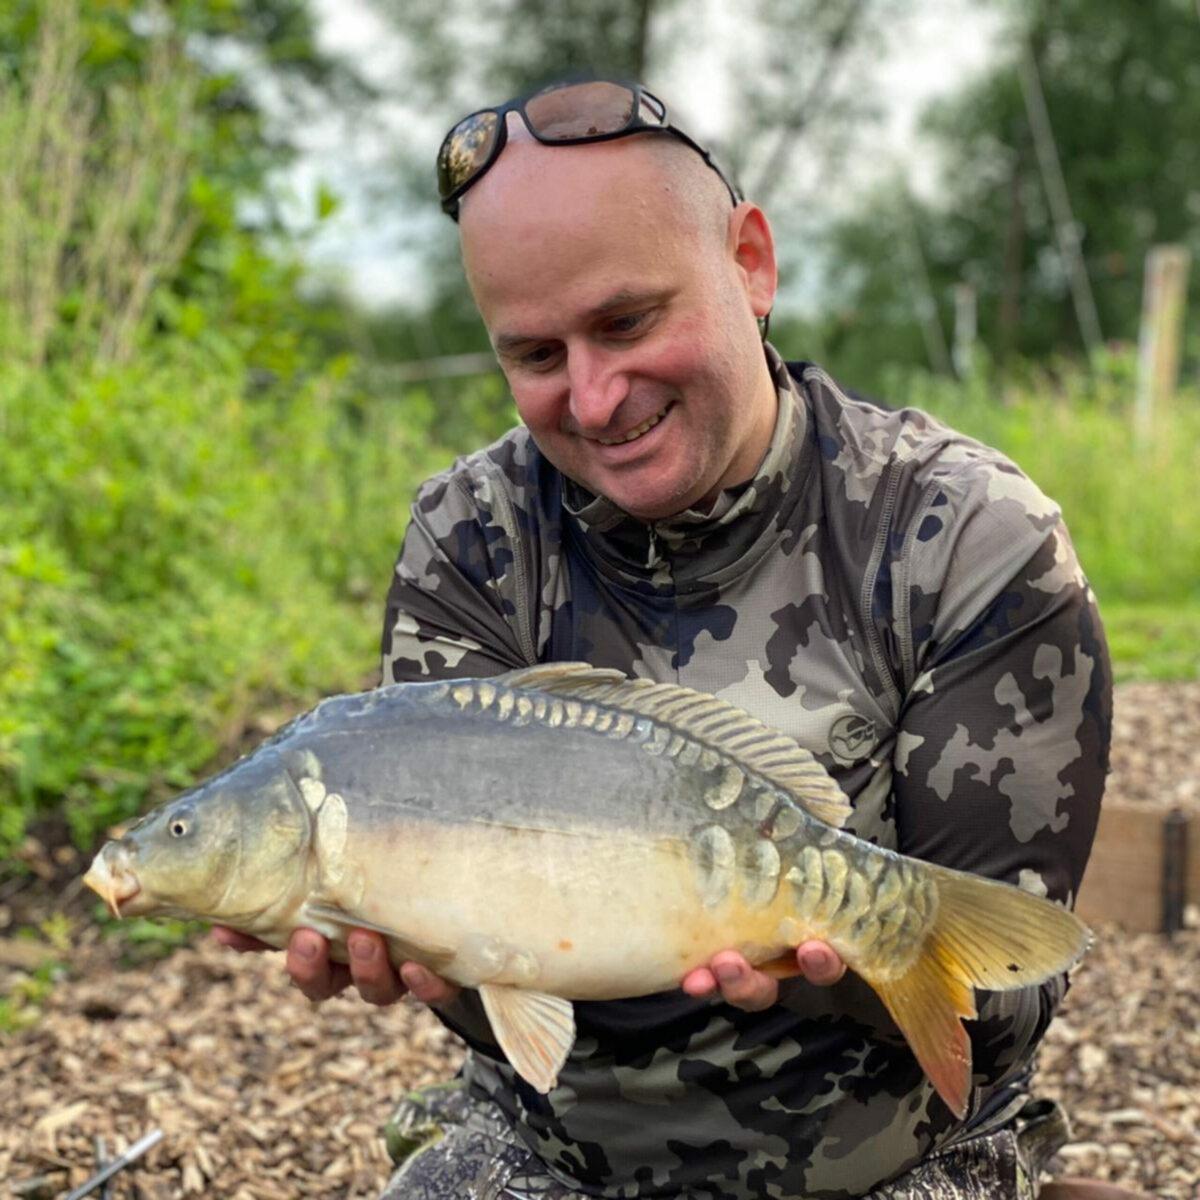 Quest Fishing Adventures - Carp Pike Barbel Chub Perch Bream Roach Gotta Catch Them All 21: Float Tactics 001 / Carp Fishing